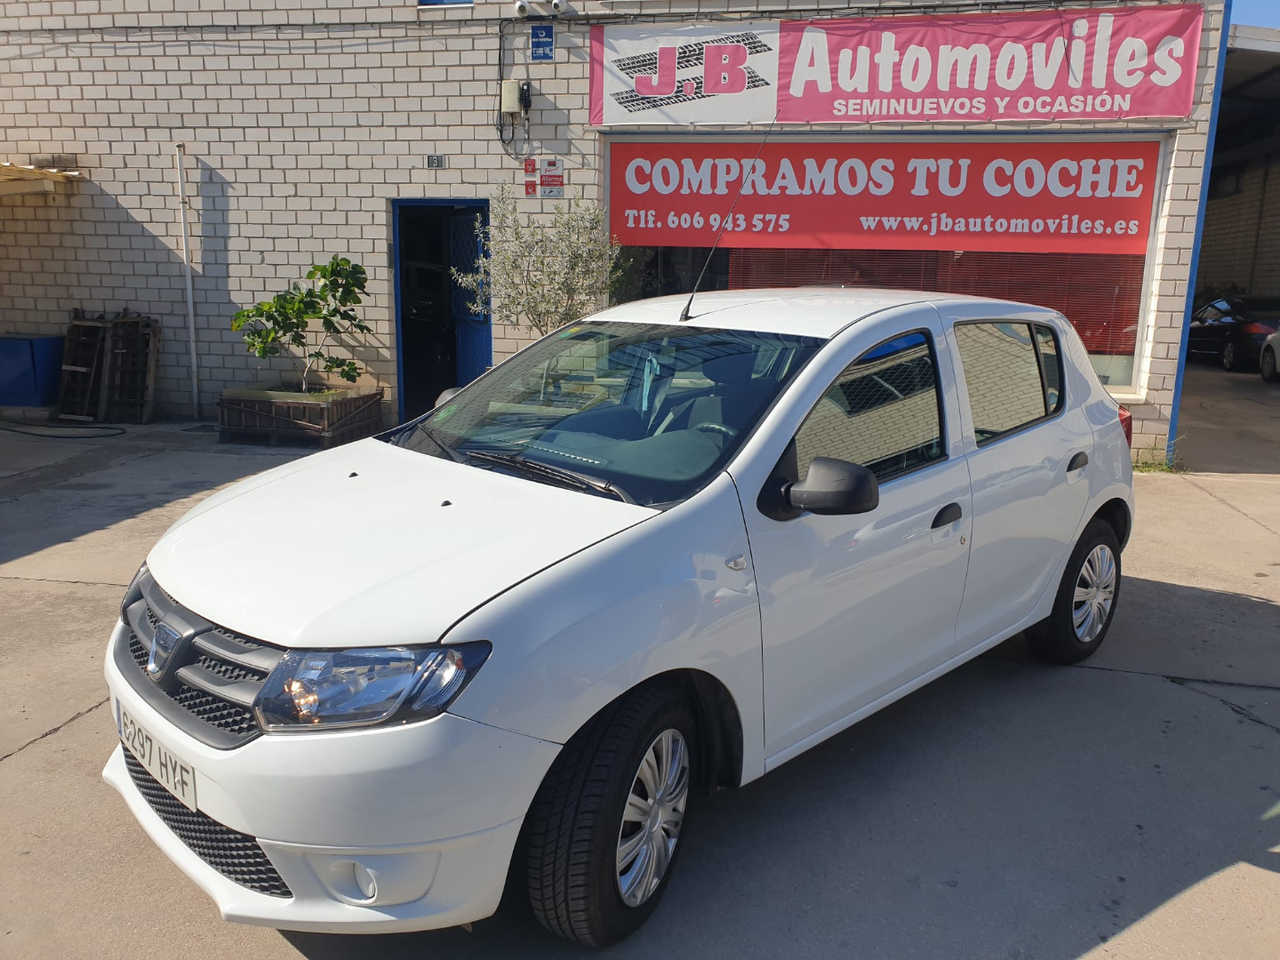 Dacia Sandero ambiance 1.2  75cv   - Foto 1